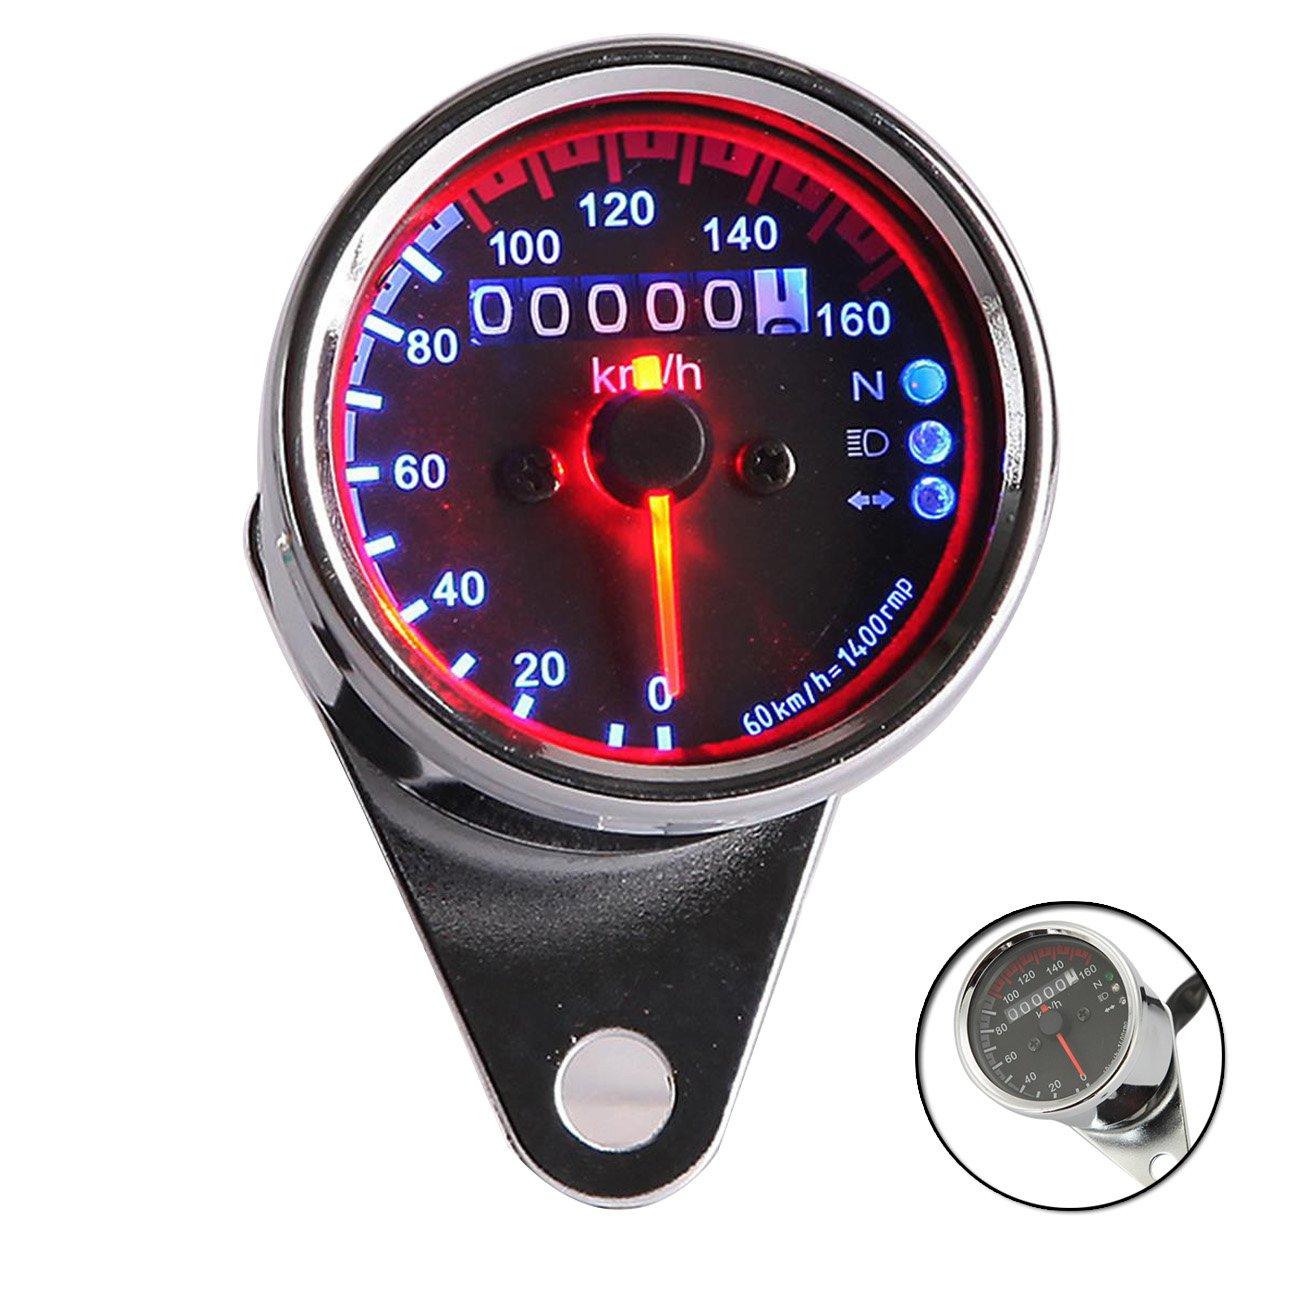 INNOGLOW 1x Universal LED Backlit Motorcycle Tachometer 0-16, 000RPM DC 12V Fit for Honda Harley Suzuki Kawasaki Yamaha